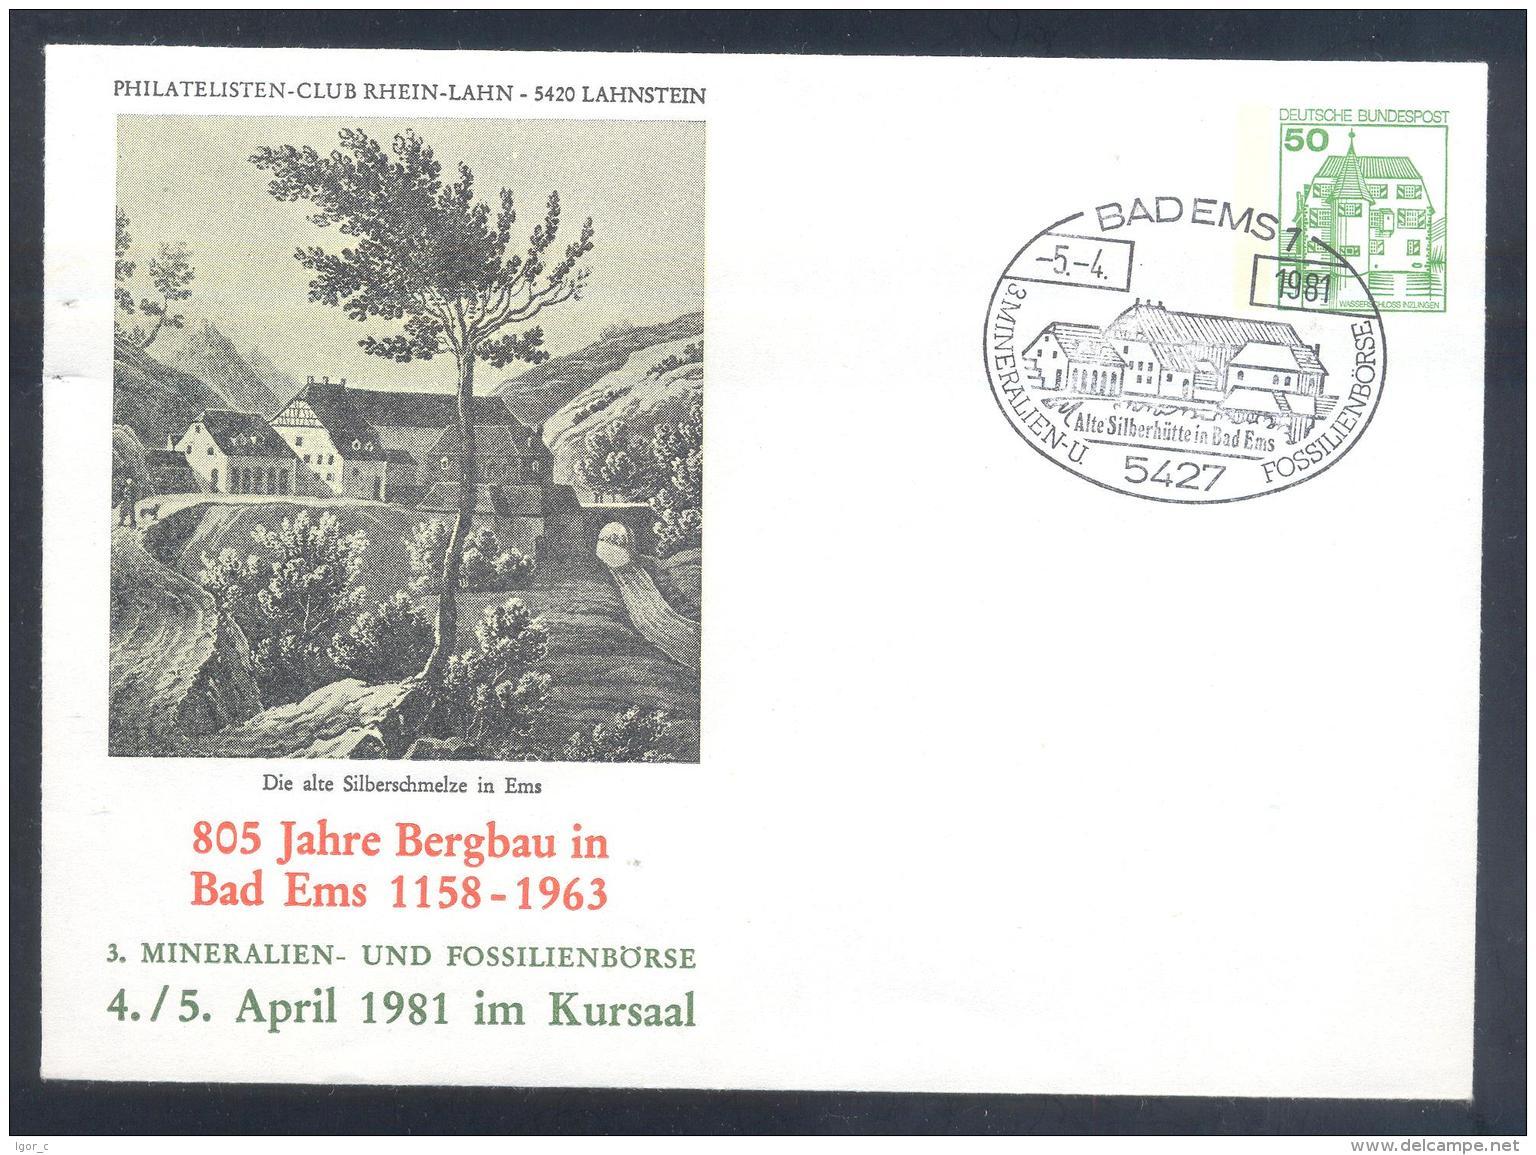 Germany 1981 Postal Stationery Cover: Minerals Fosil Fossil Mine Mineralien Paleontolyogy Speleology: Bergbau Bad Ems - Mineralien